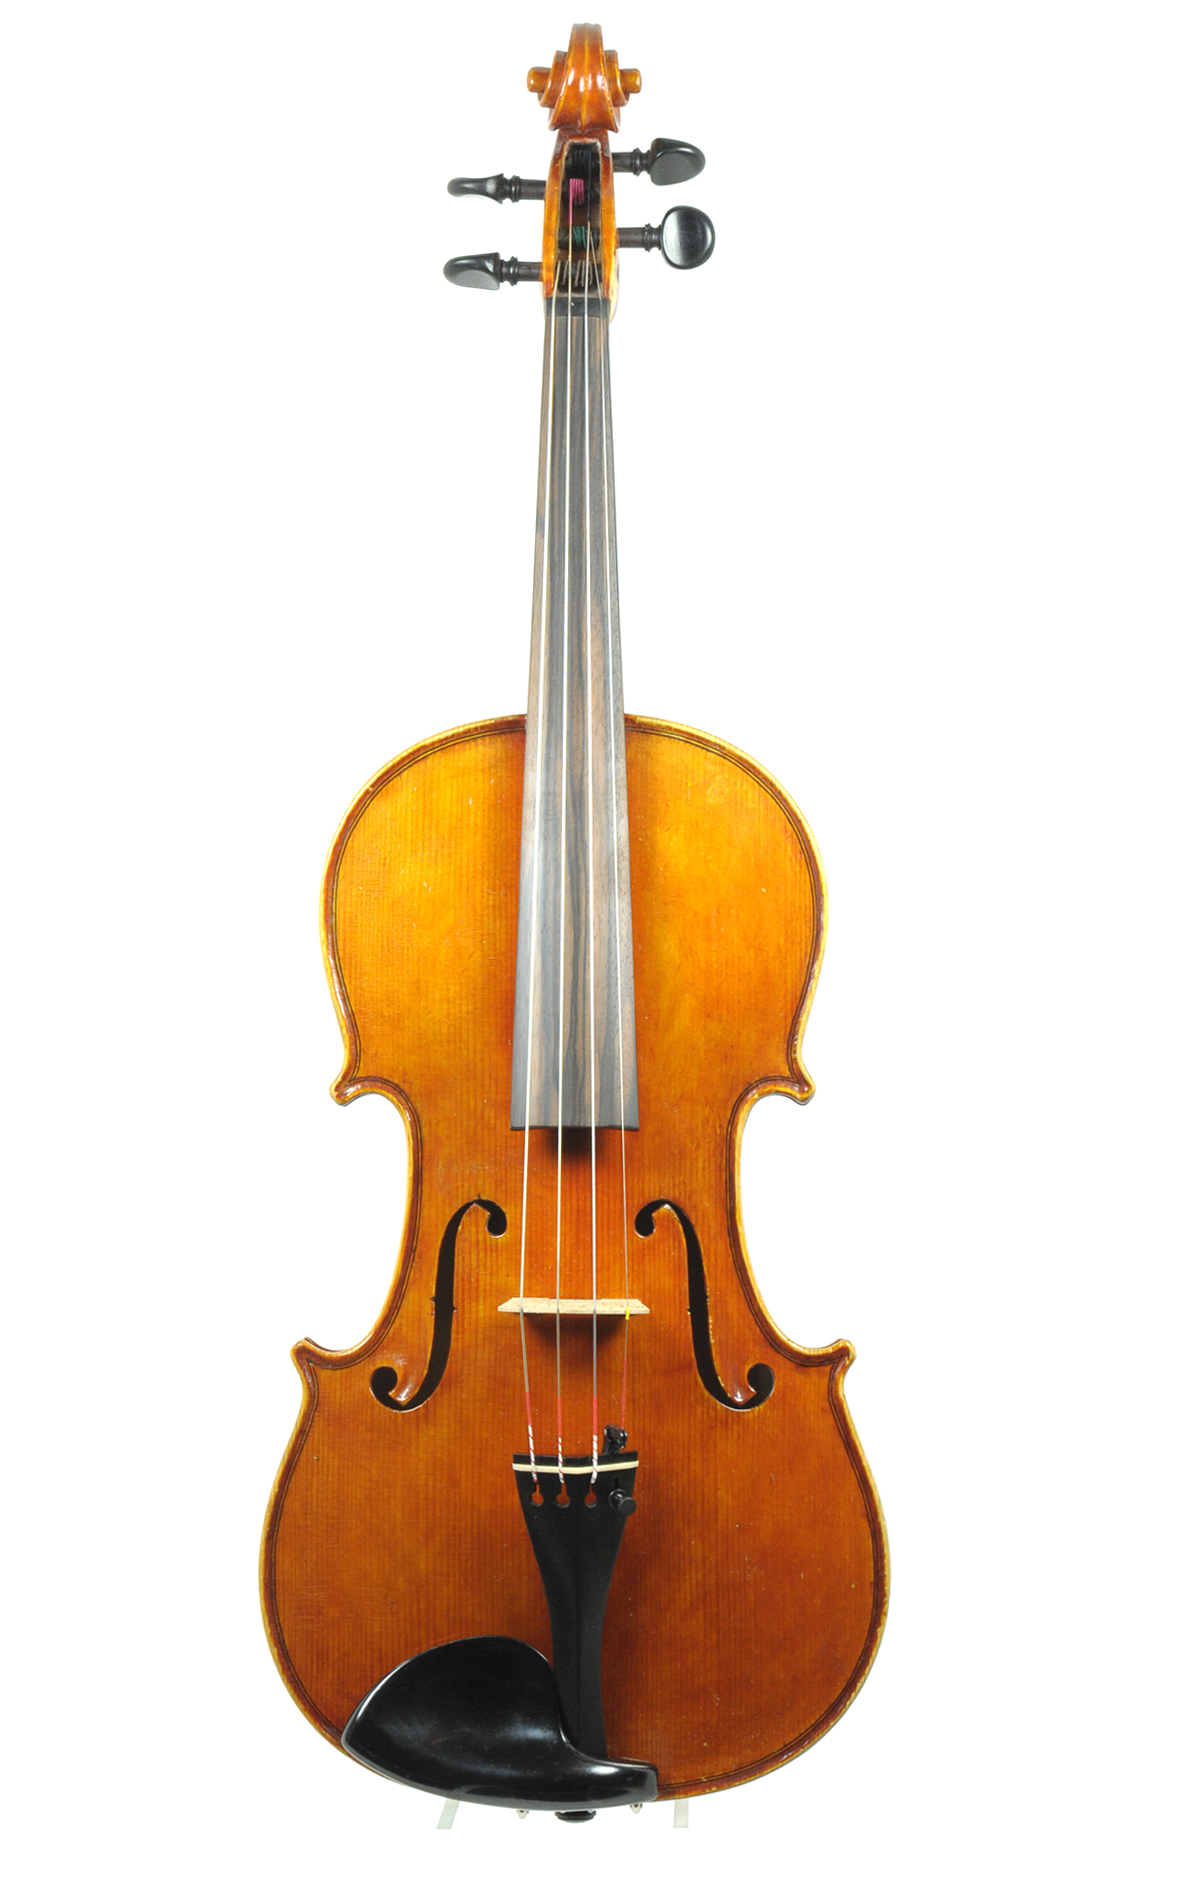 from Benson dating german violins